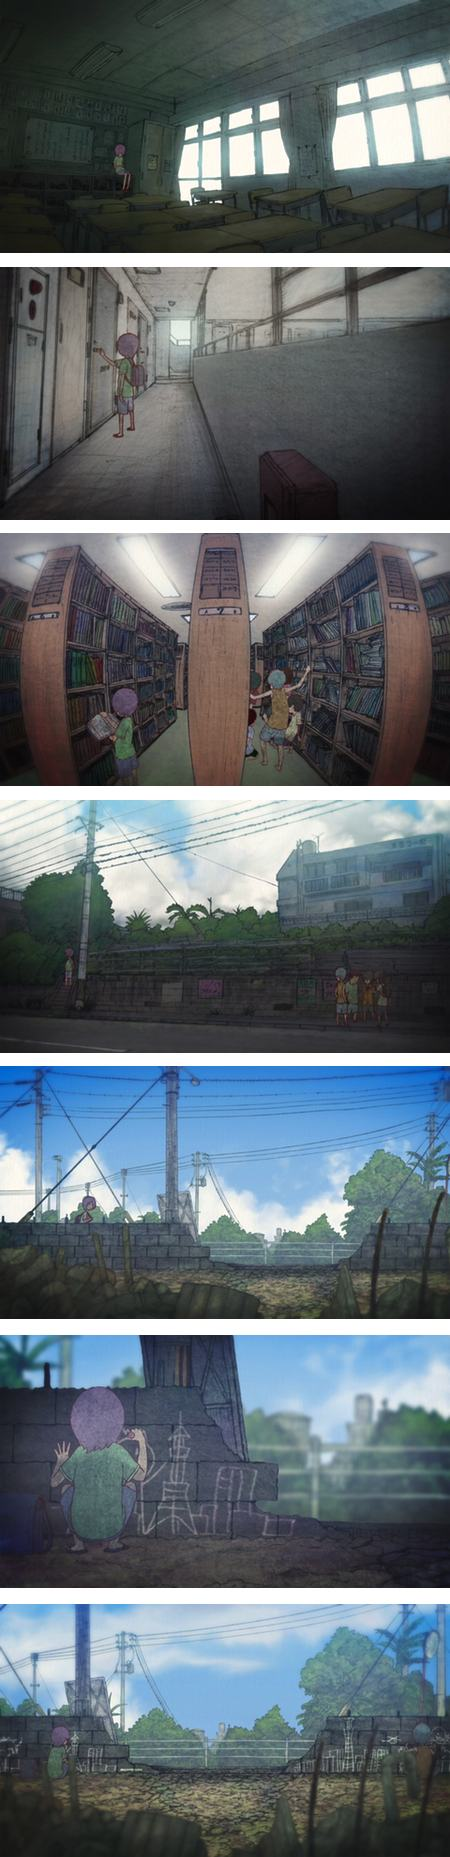 Playground, animated short by Ryosuke Oshiro